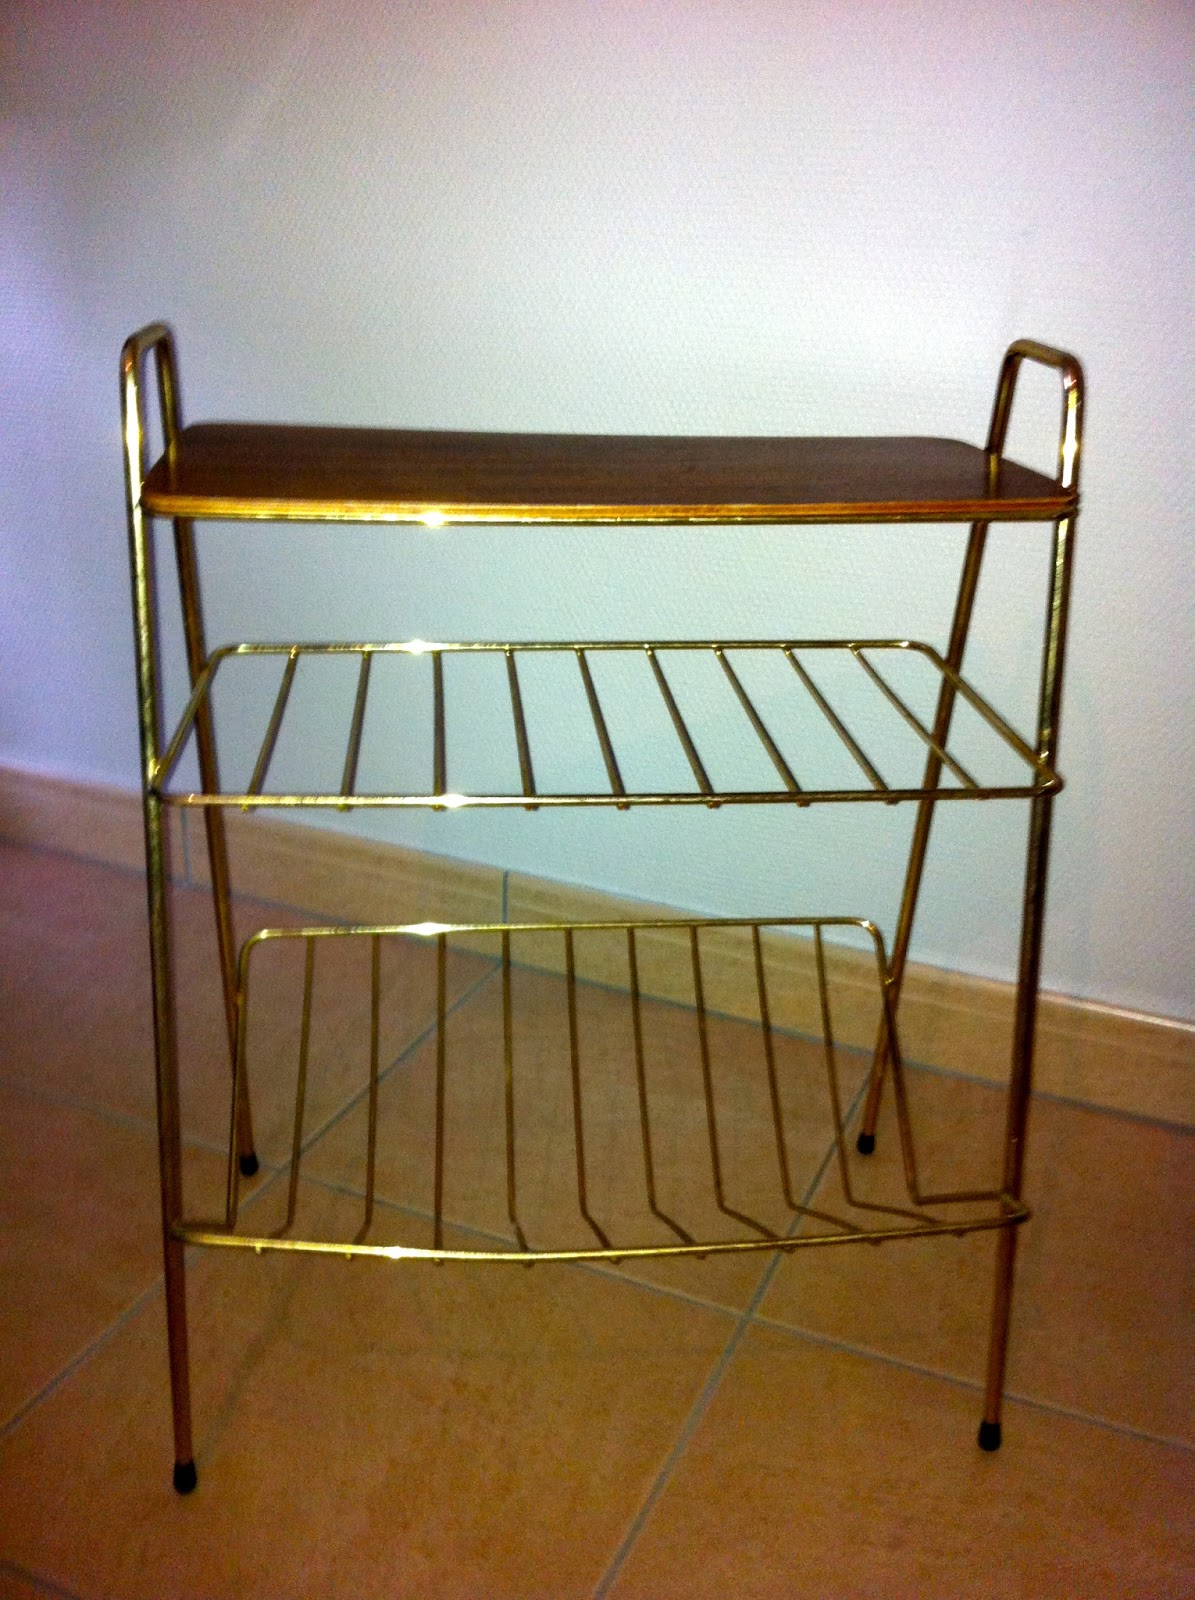 m m marcelle porte revues tablette. Black Bedroom Furniture Sets. Home Design Ideas